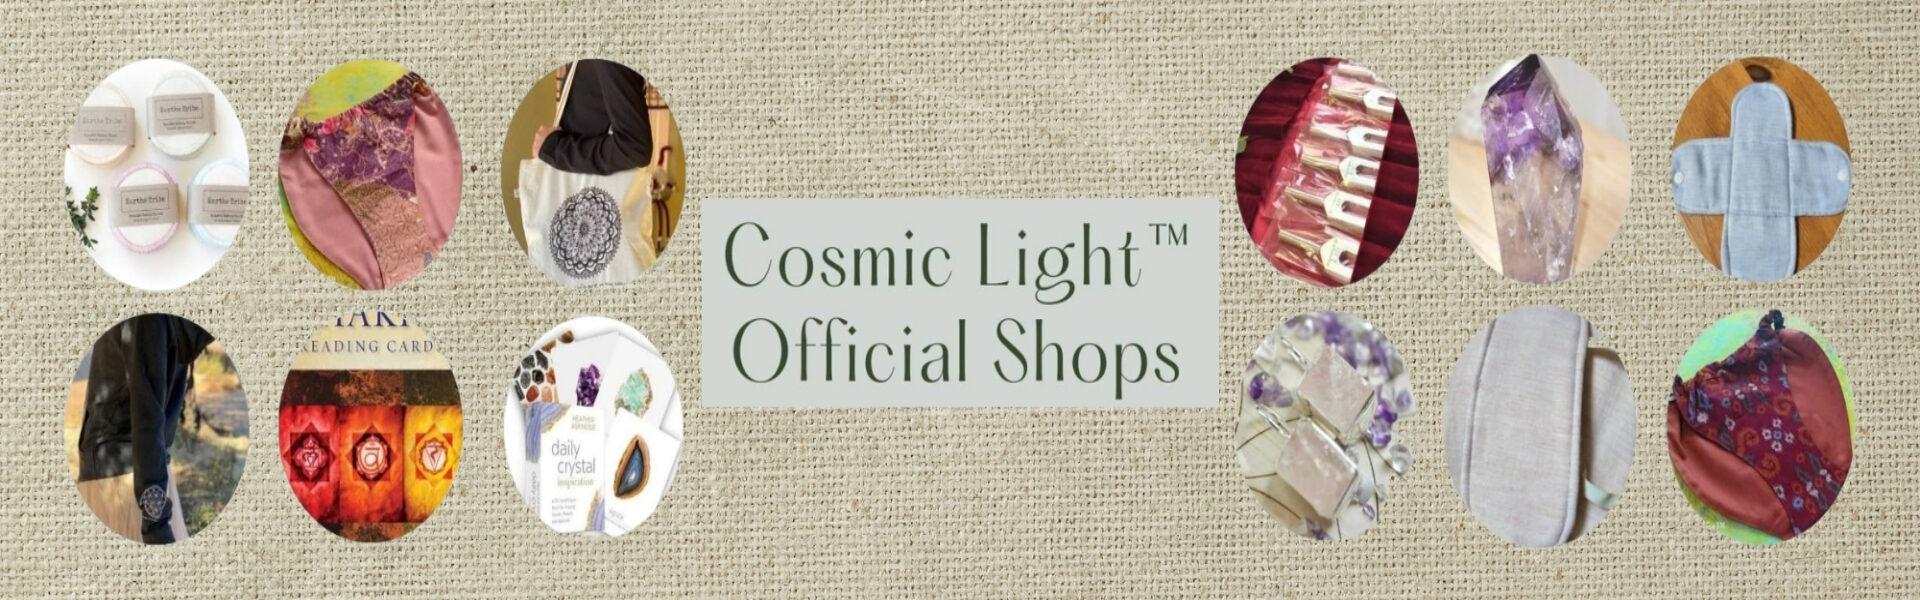 Cosmic Light™ Official Shops